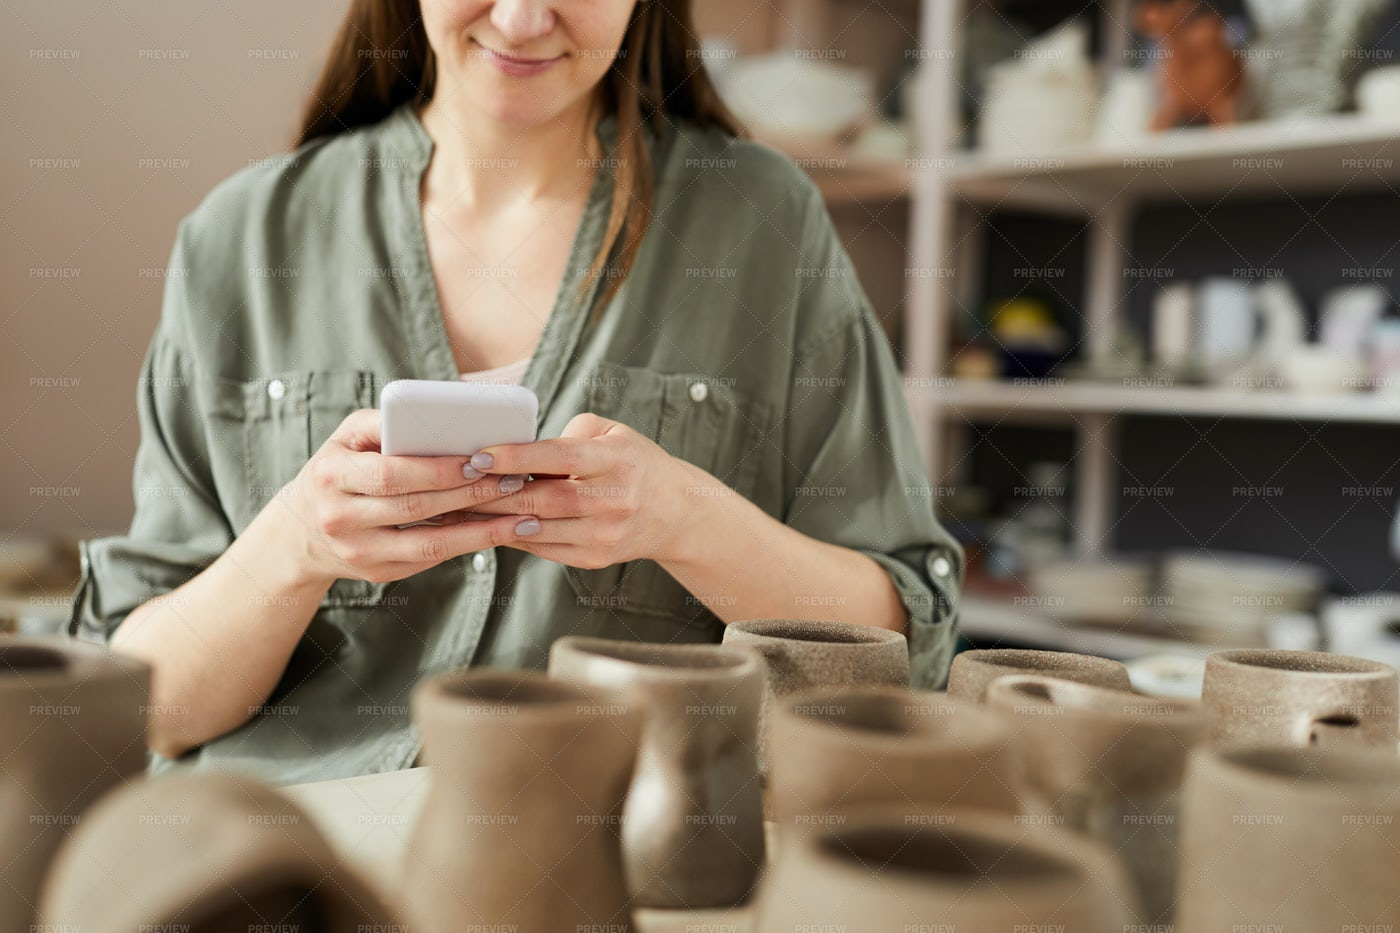 Female Potter Using Smartphone: Stock Photos